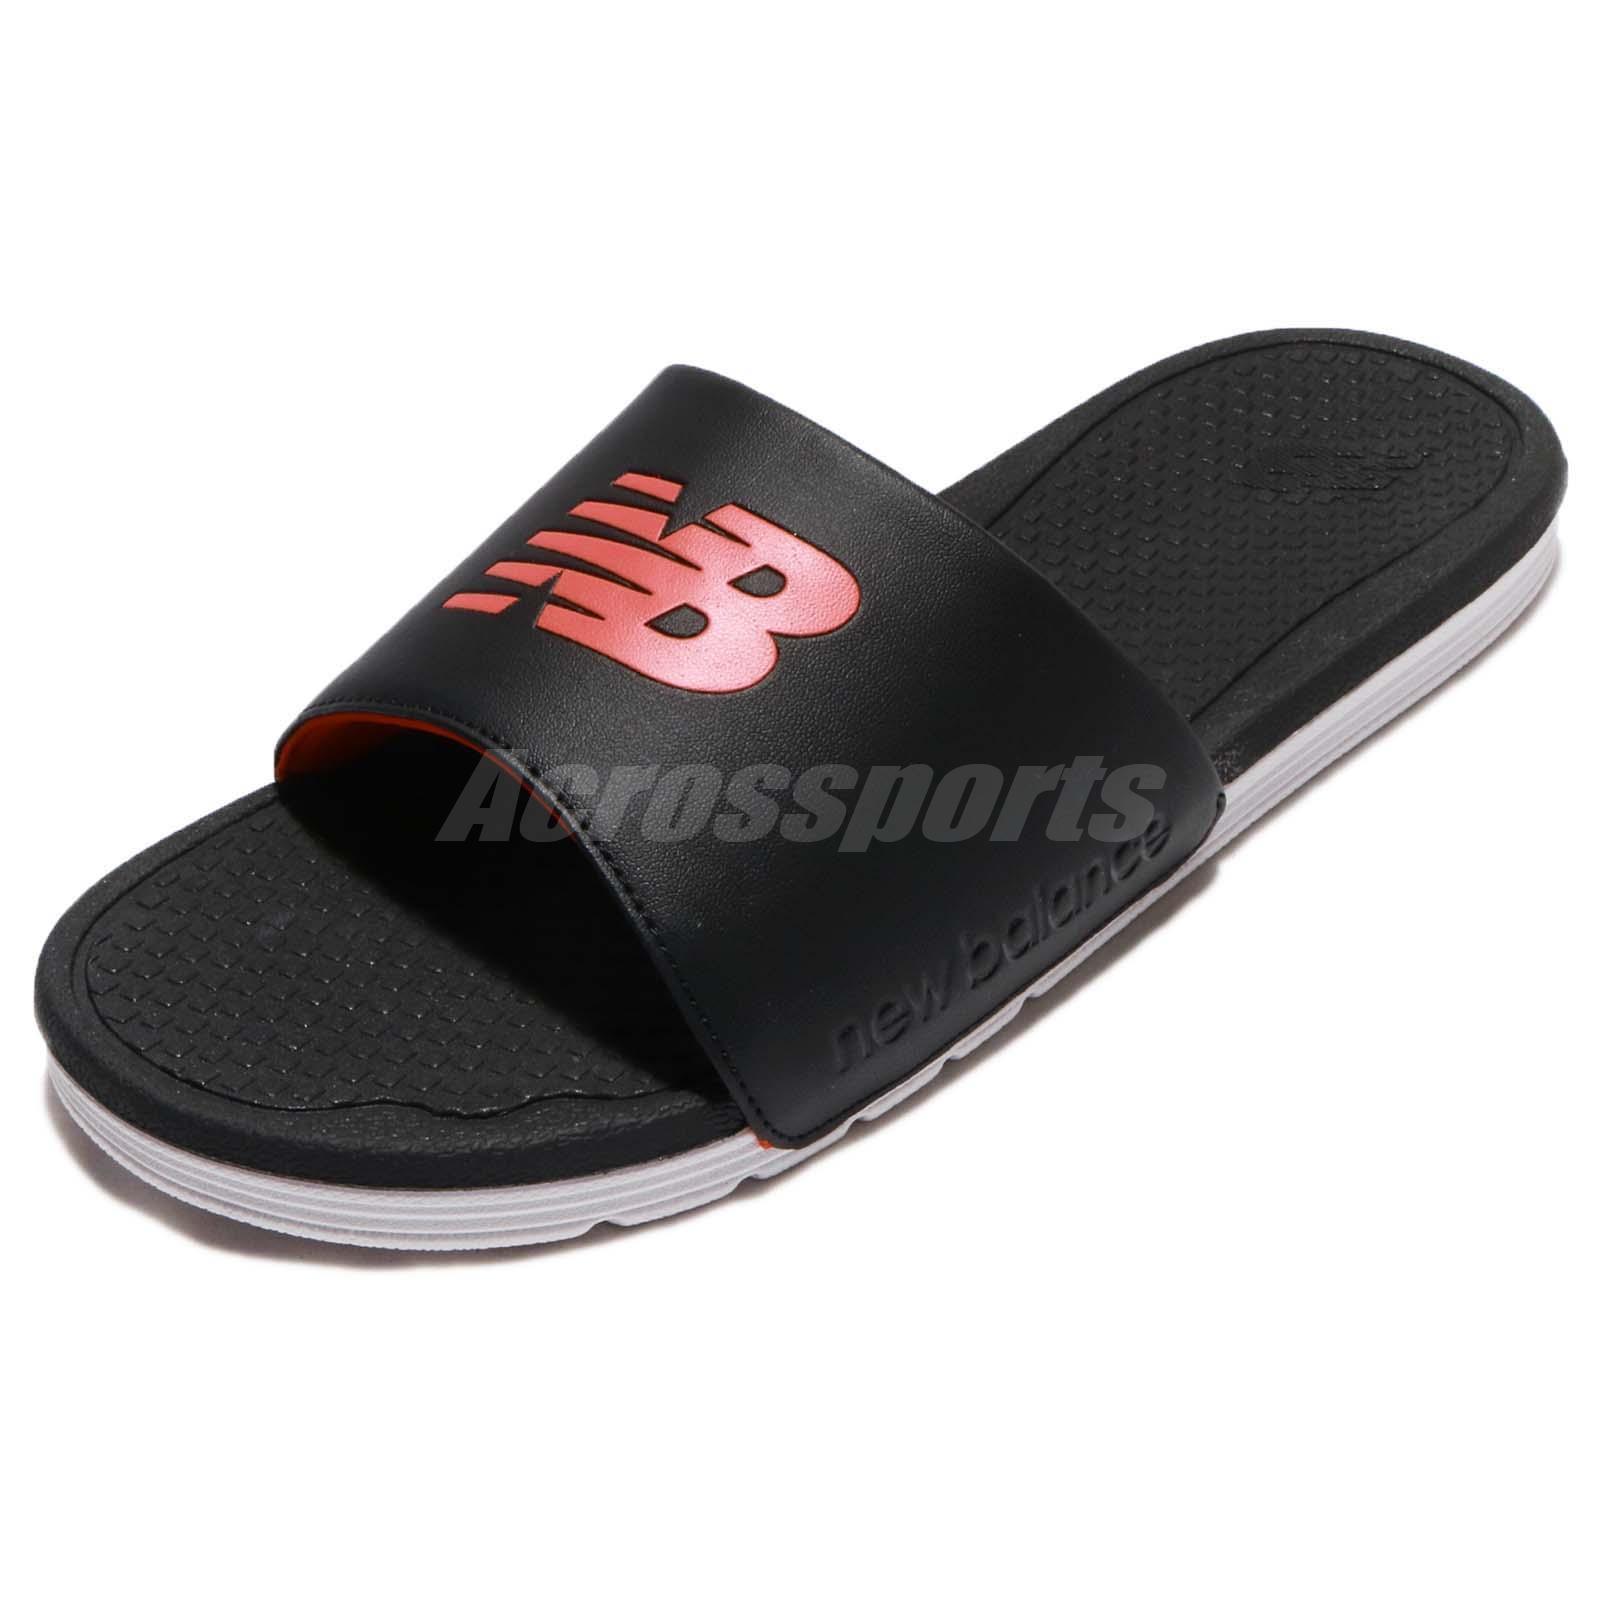 d66fe2717e9b4 ... discount code for new balance m3068bwd d black red white sports sandal  slides slippers m3068bwdd 379dd